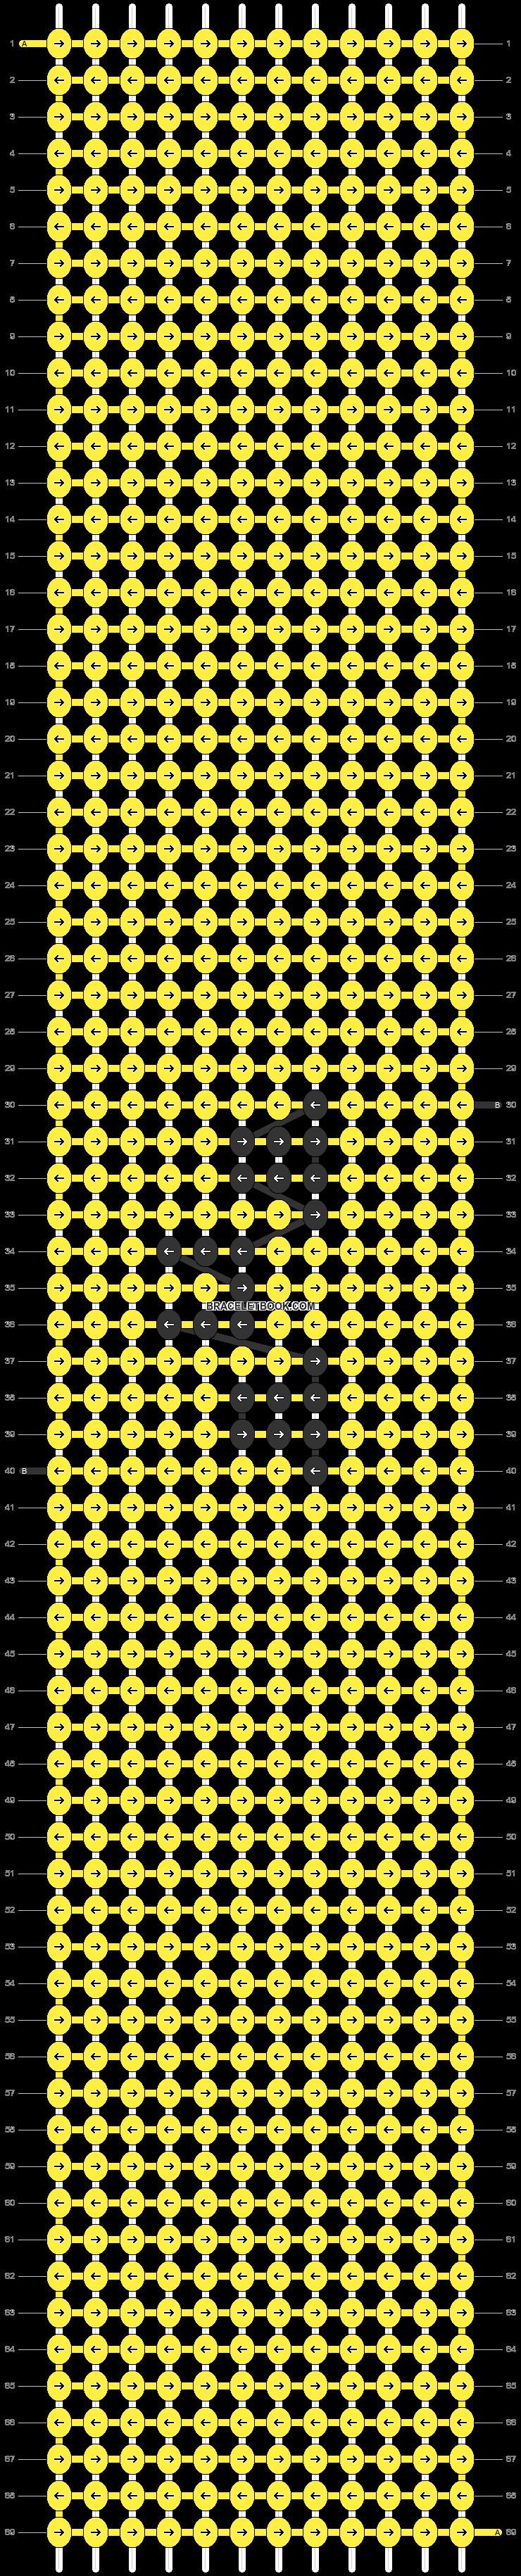 Alpha pattern #47078 pattern